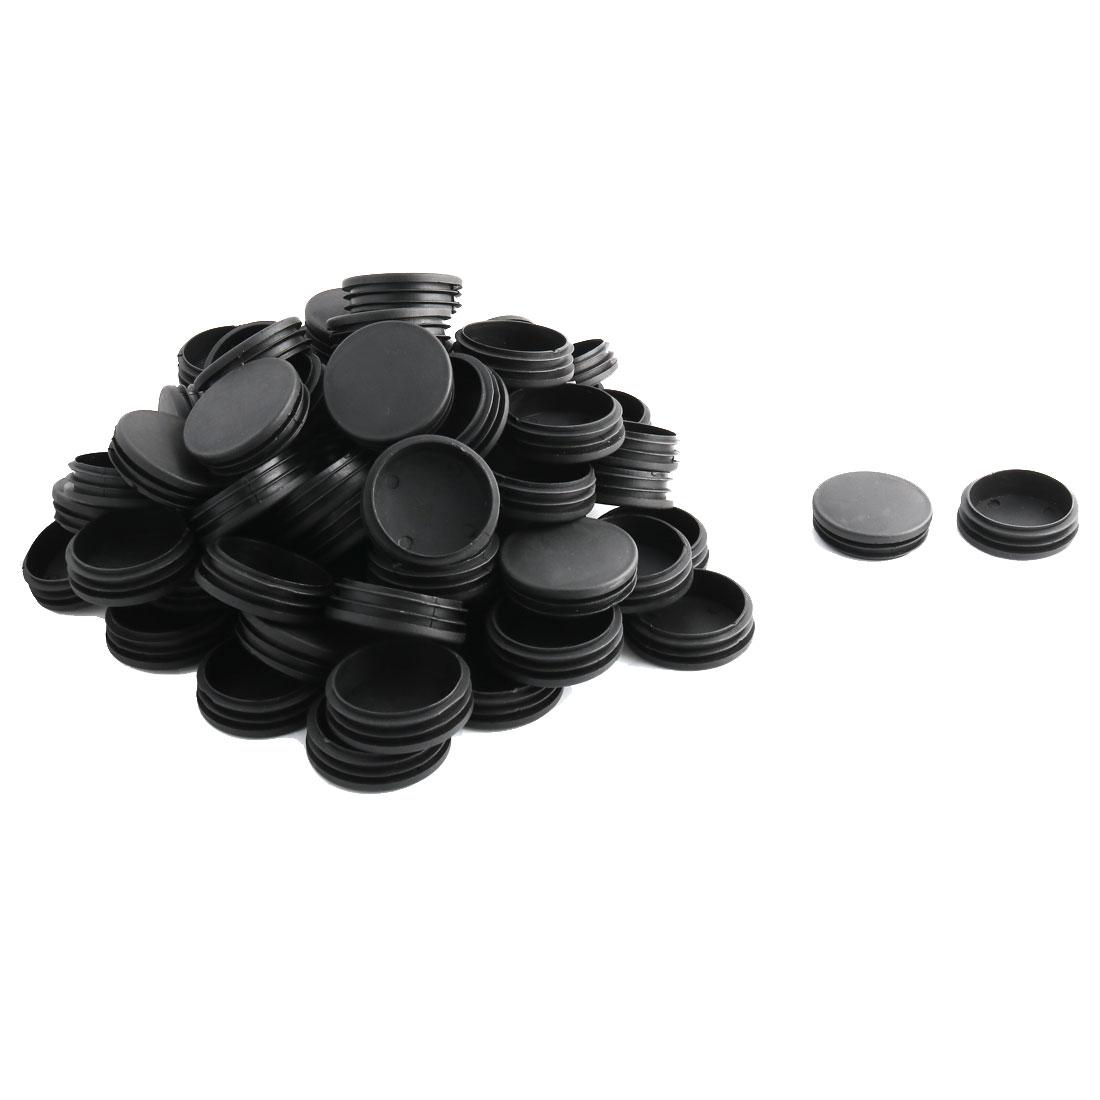 Household Office Plastic Round Furniture Legs Tube Insert Black 60mm Dia 80 Pcs